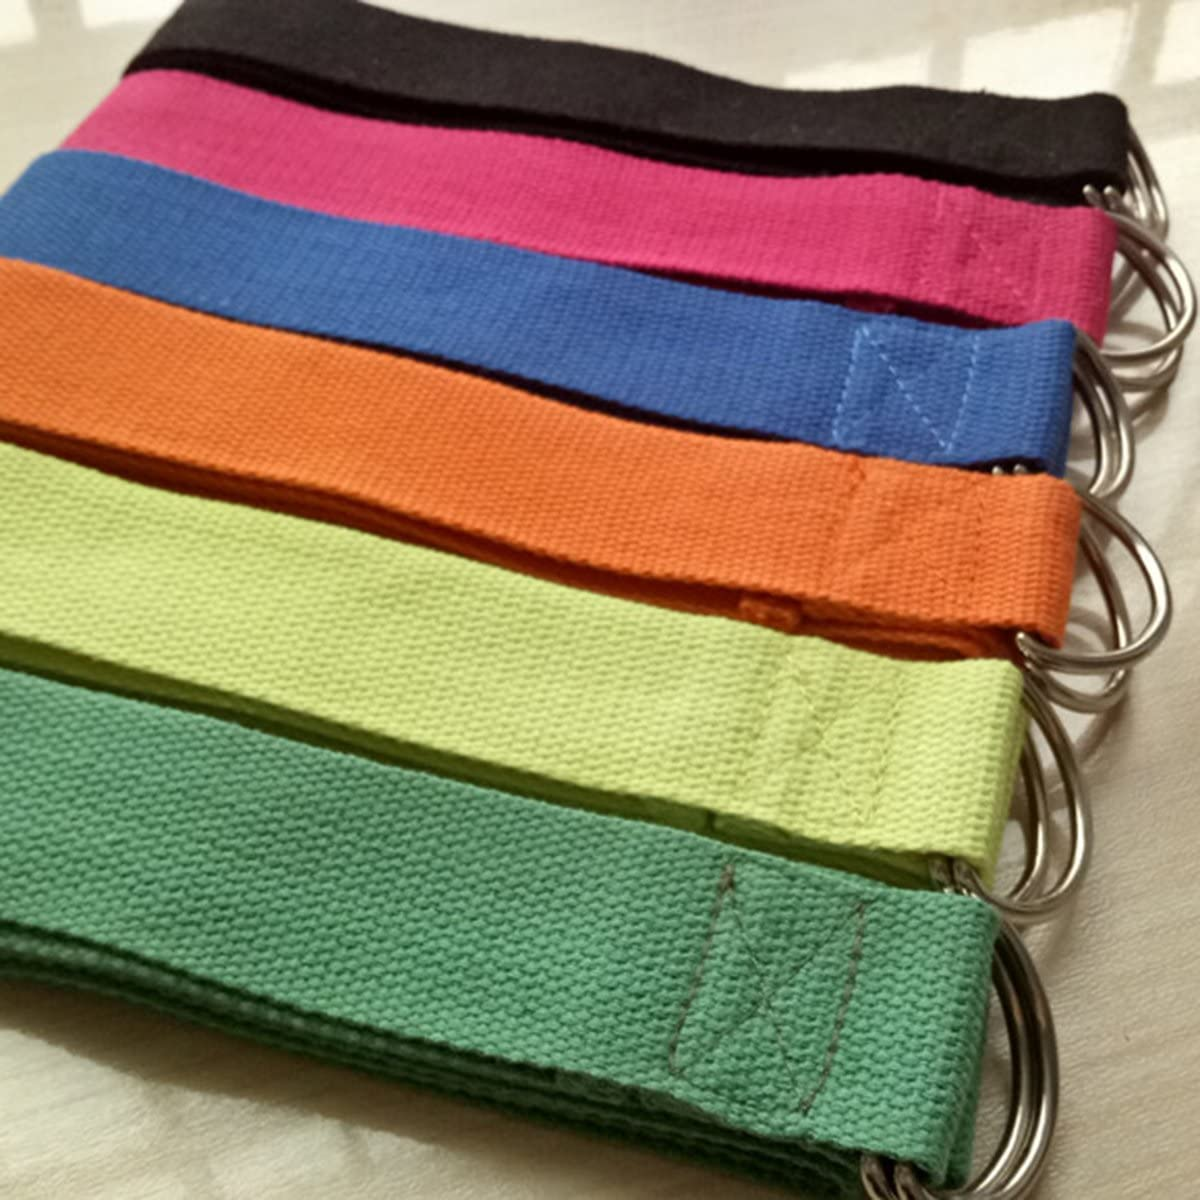 WINOMO Yoga Fitness Strap D Ring Yoga /Übung Strap f/ür Stretching Flexibilit/ät Physikalische Therapie